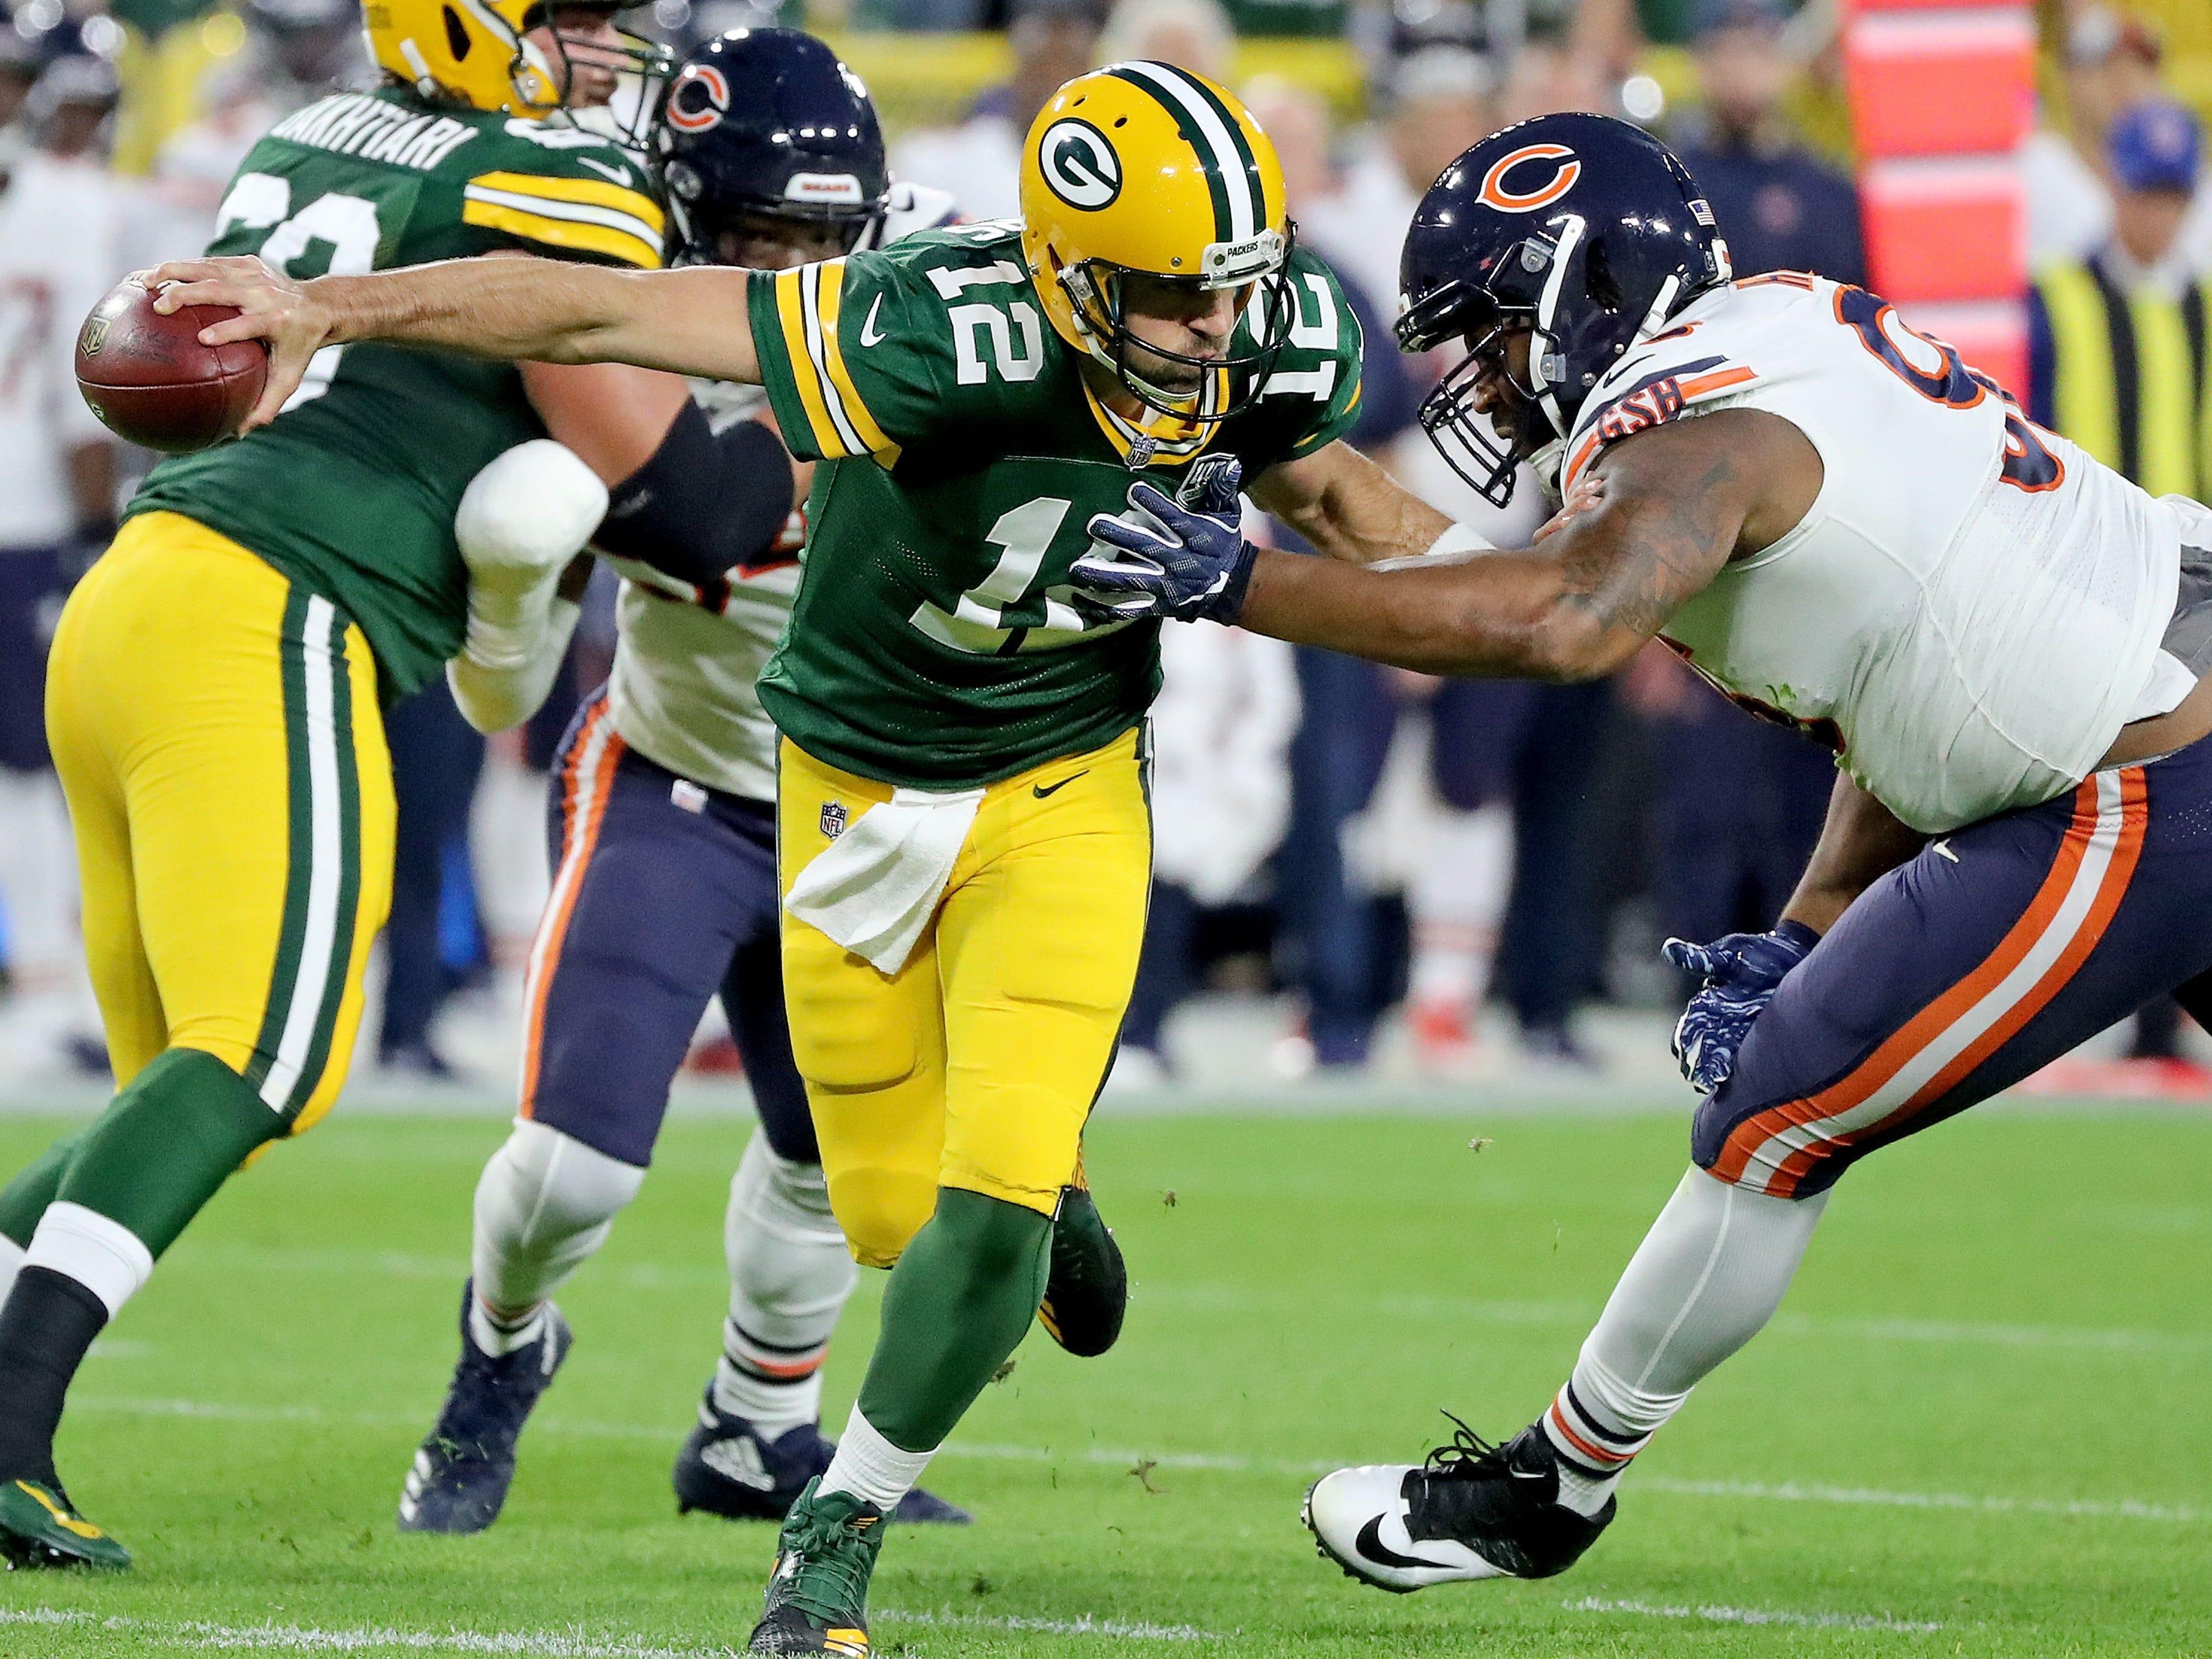 Week 15: Bears at Packers, noon CT Sunday, Dec. 15, Lambeau Field (Fox)